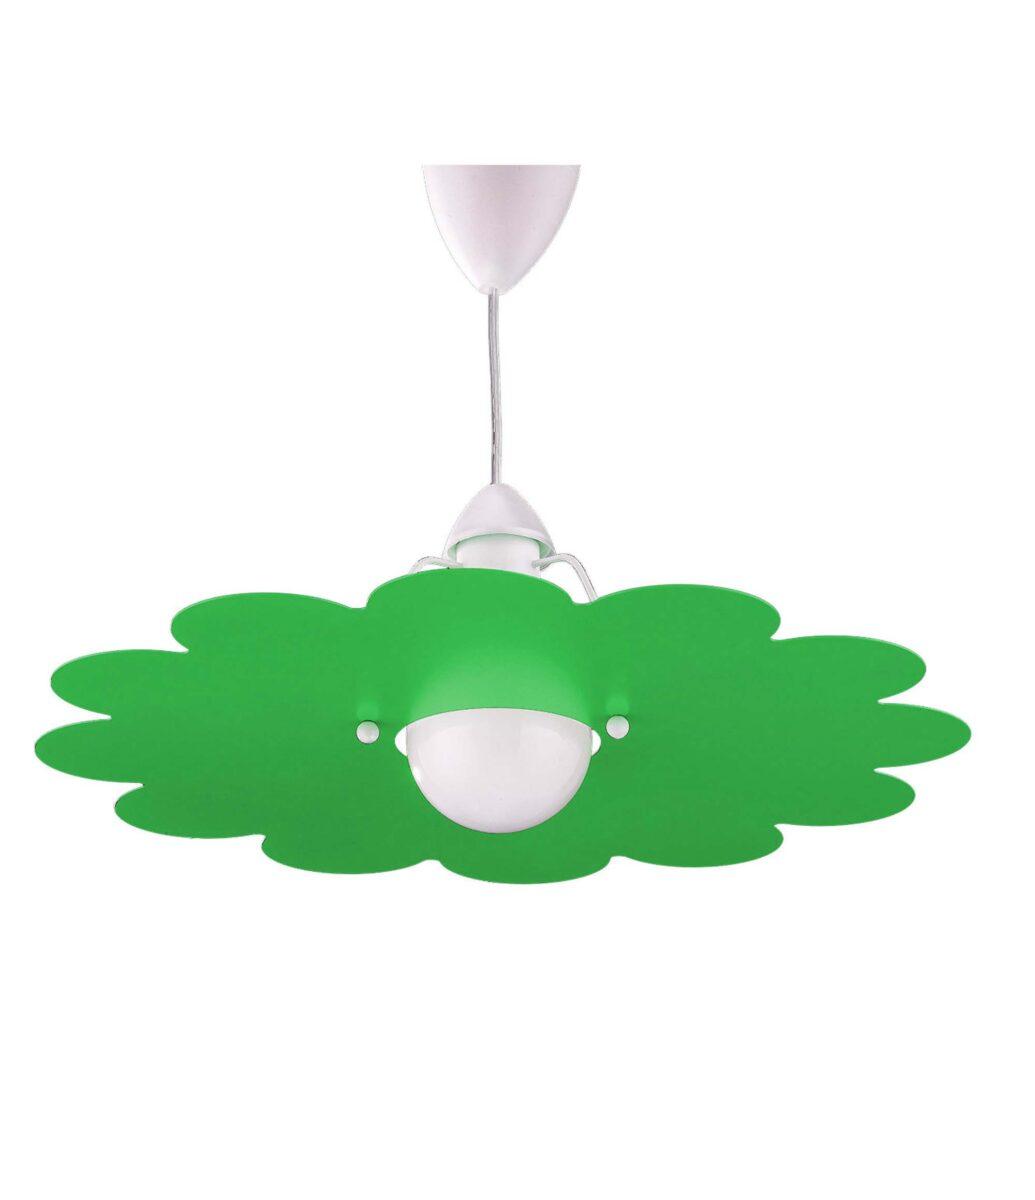 Lampadari camerette bambini vendita la luce del futuro - Lampadari ikea bambini ...